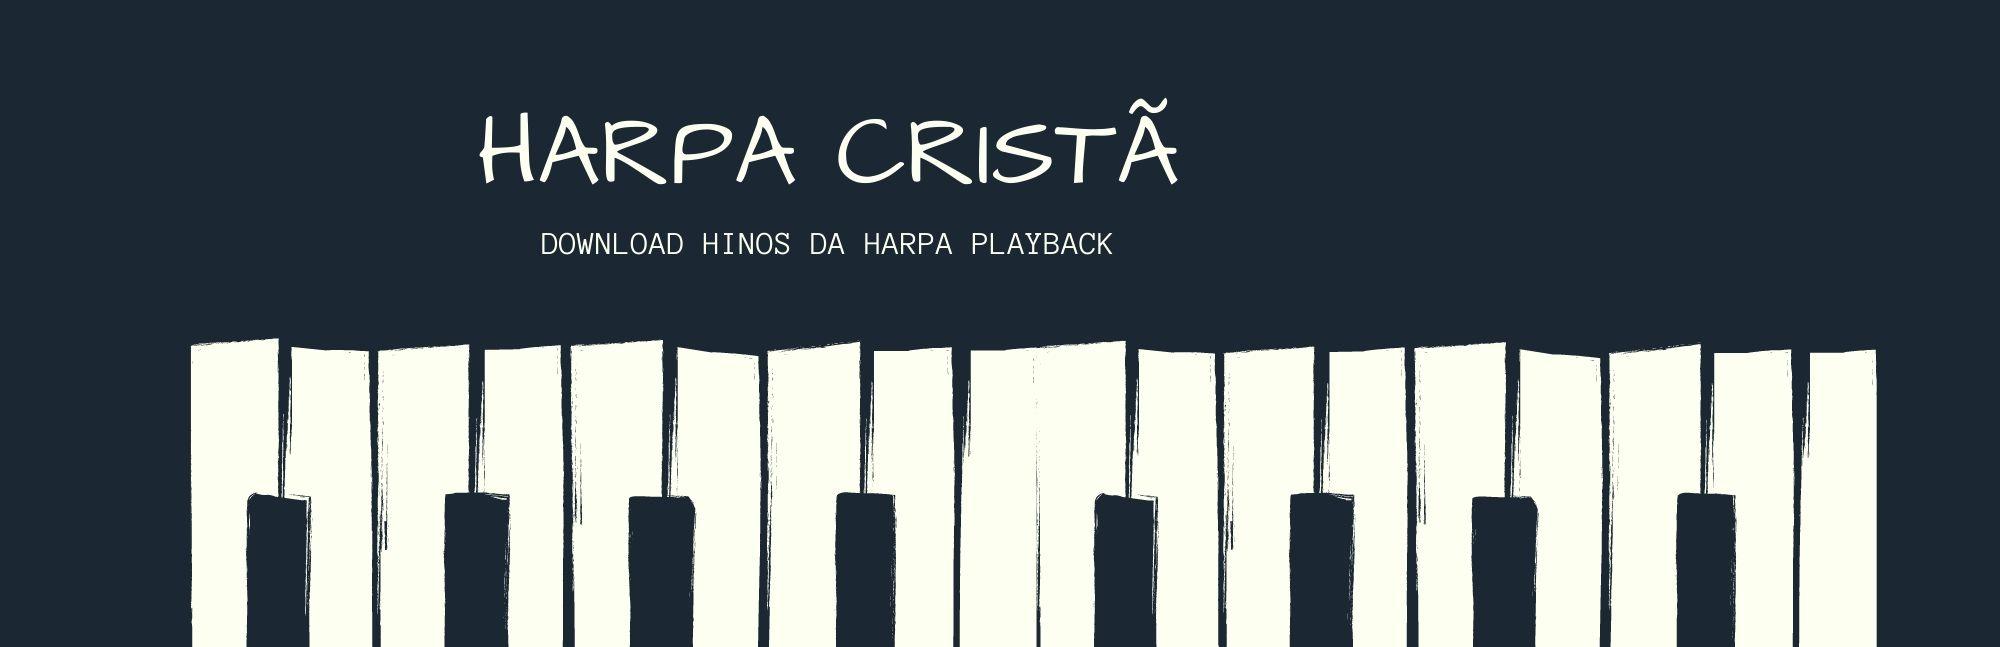 Confira 30 Hinos da Harpa Cristã playback para baixar e louvar a Deus –  Hinos da Harpa